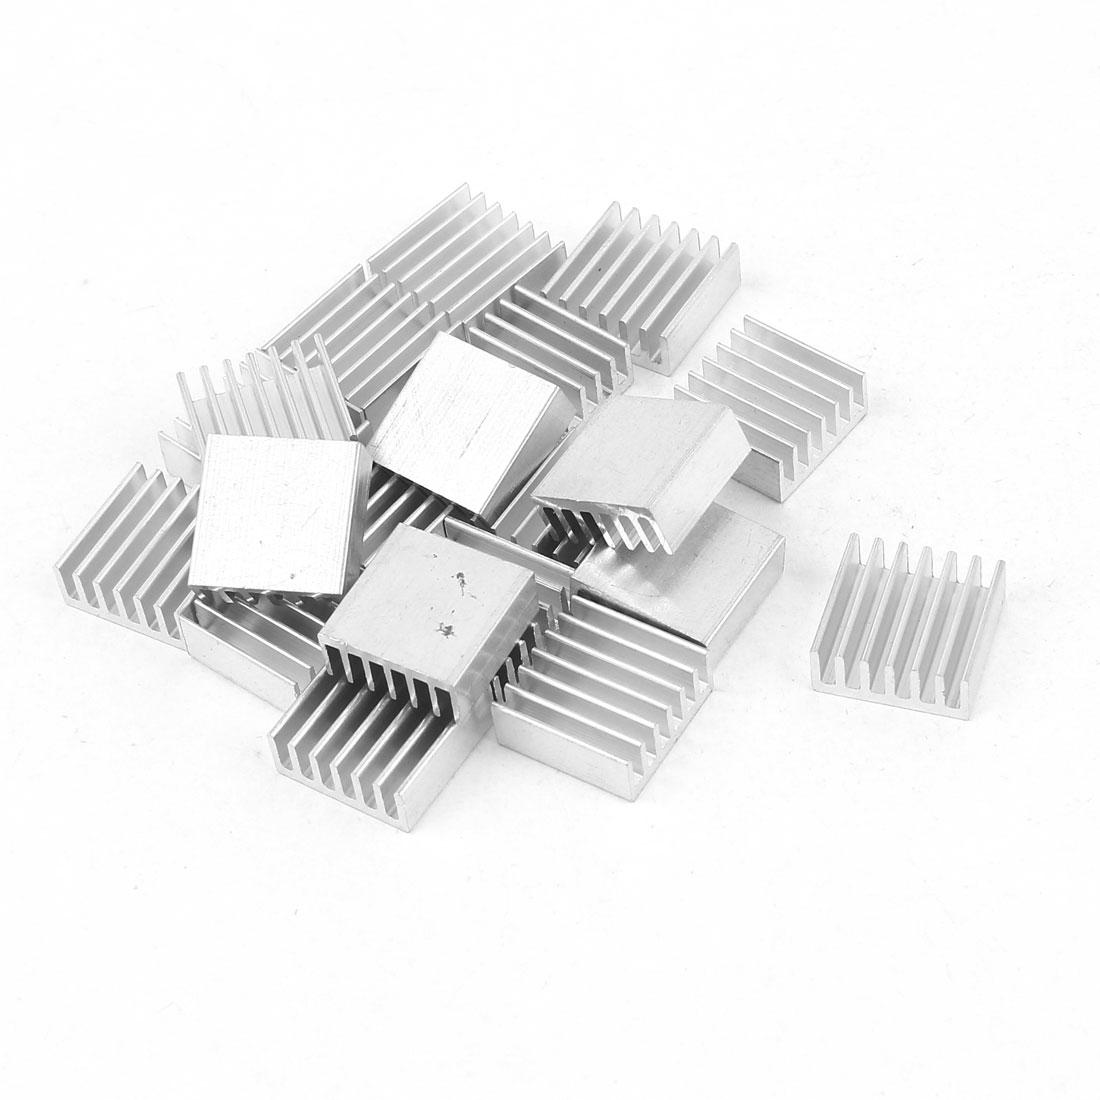 20 Pcs Aluminum Heatsinks Radiator Cooling Fin Cooler 14mmx14mmx6mm Silver Tone